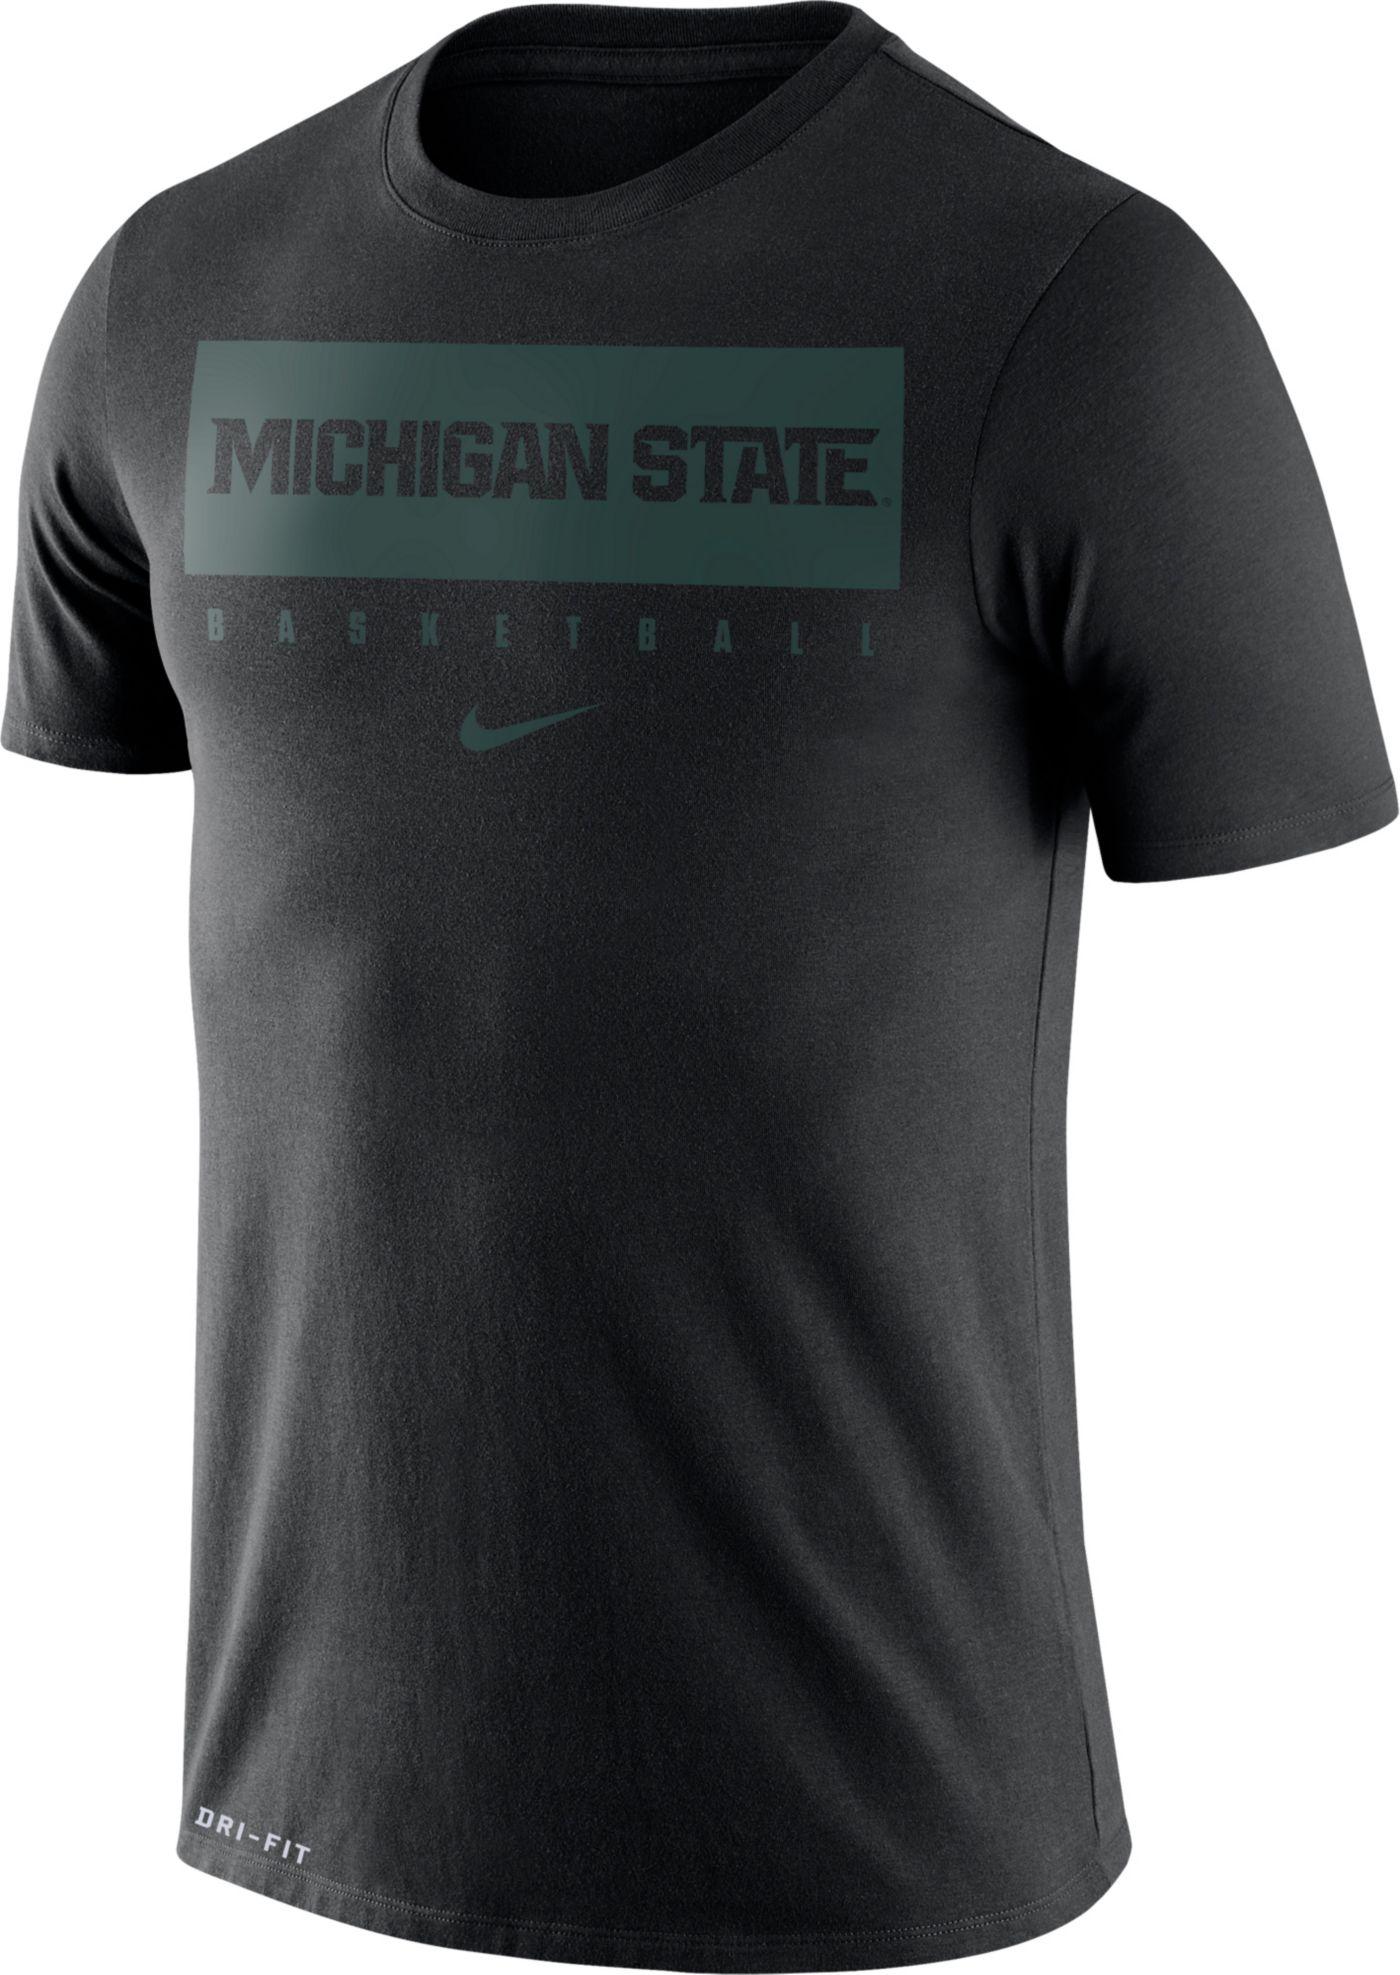 Nike Men's Michigan State Spartans Basketball Legend Practice Black T-Shirt